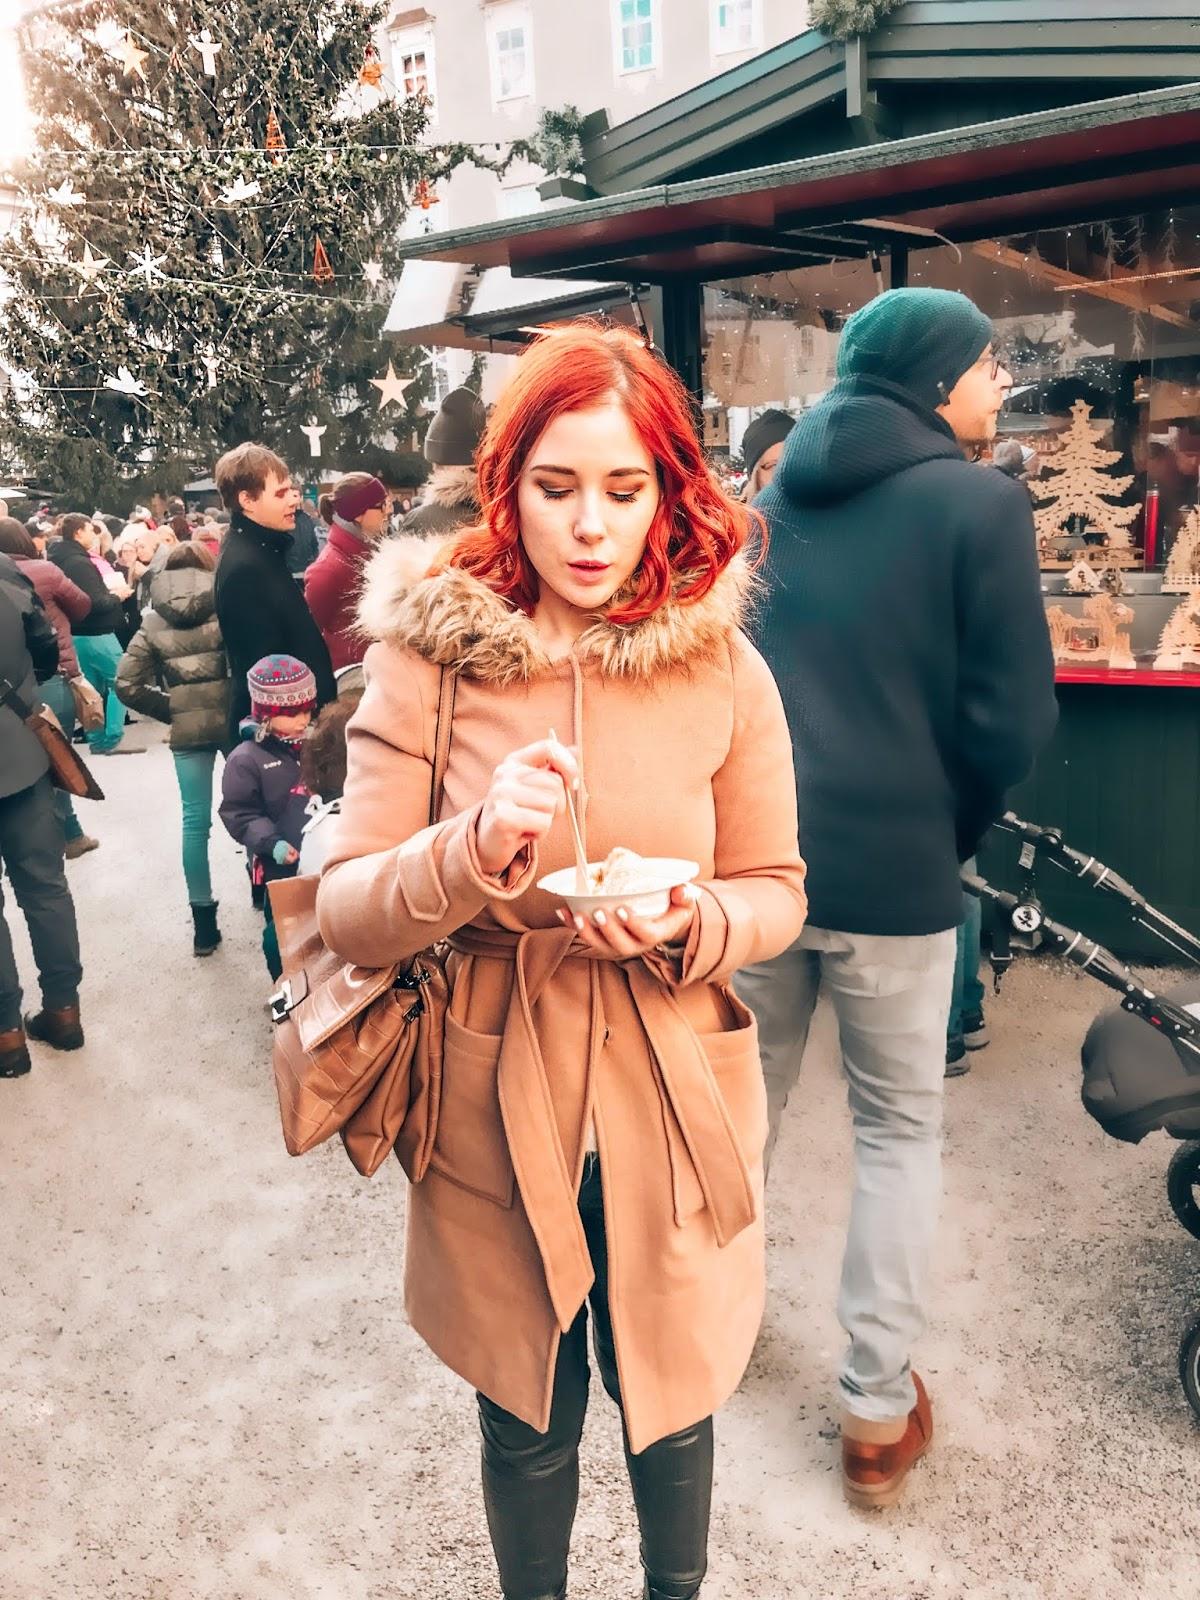 slovenska modna blogerka spela seserko na izletu v salzburgu